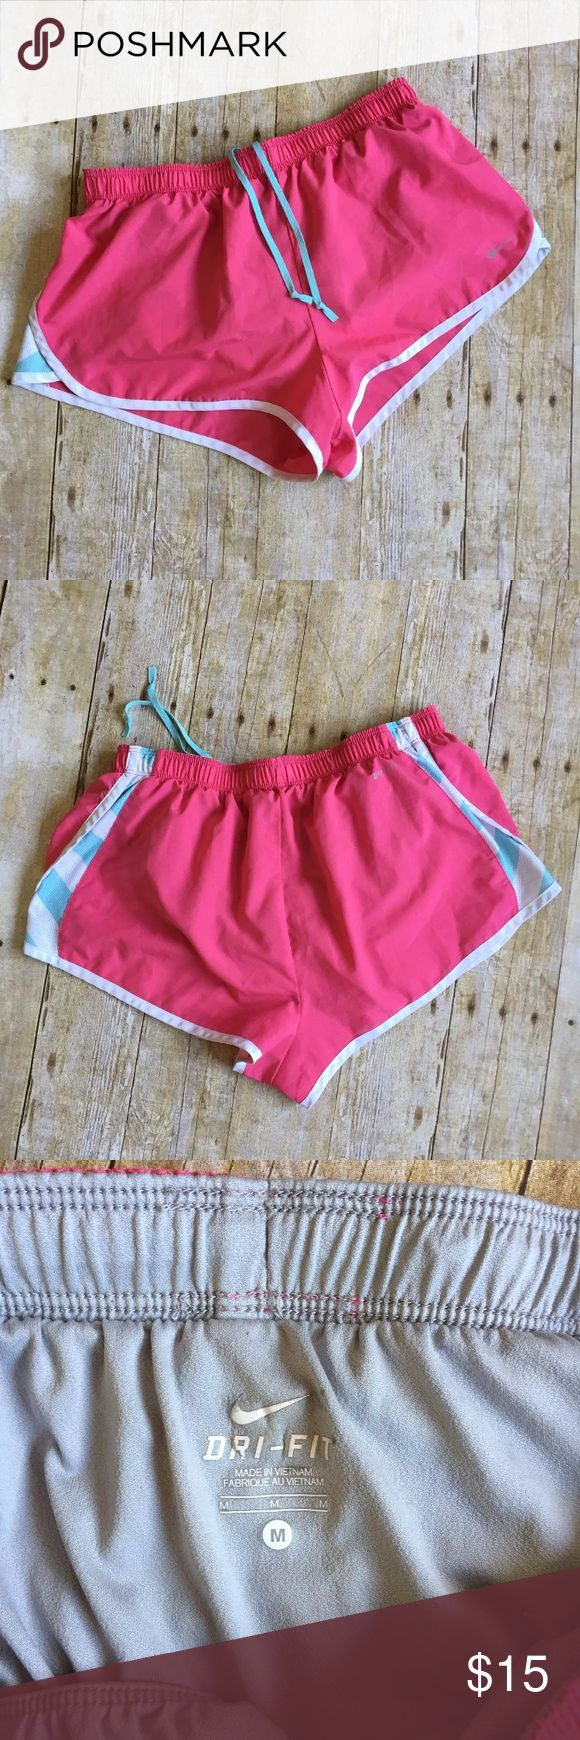 Nike Women's Pink Shorts, size medium Pink running shorts, dri-fit, size medium. Gently worn. No issues Nike Shorts